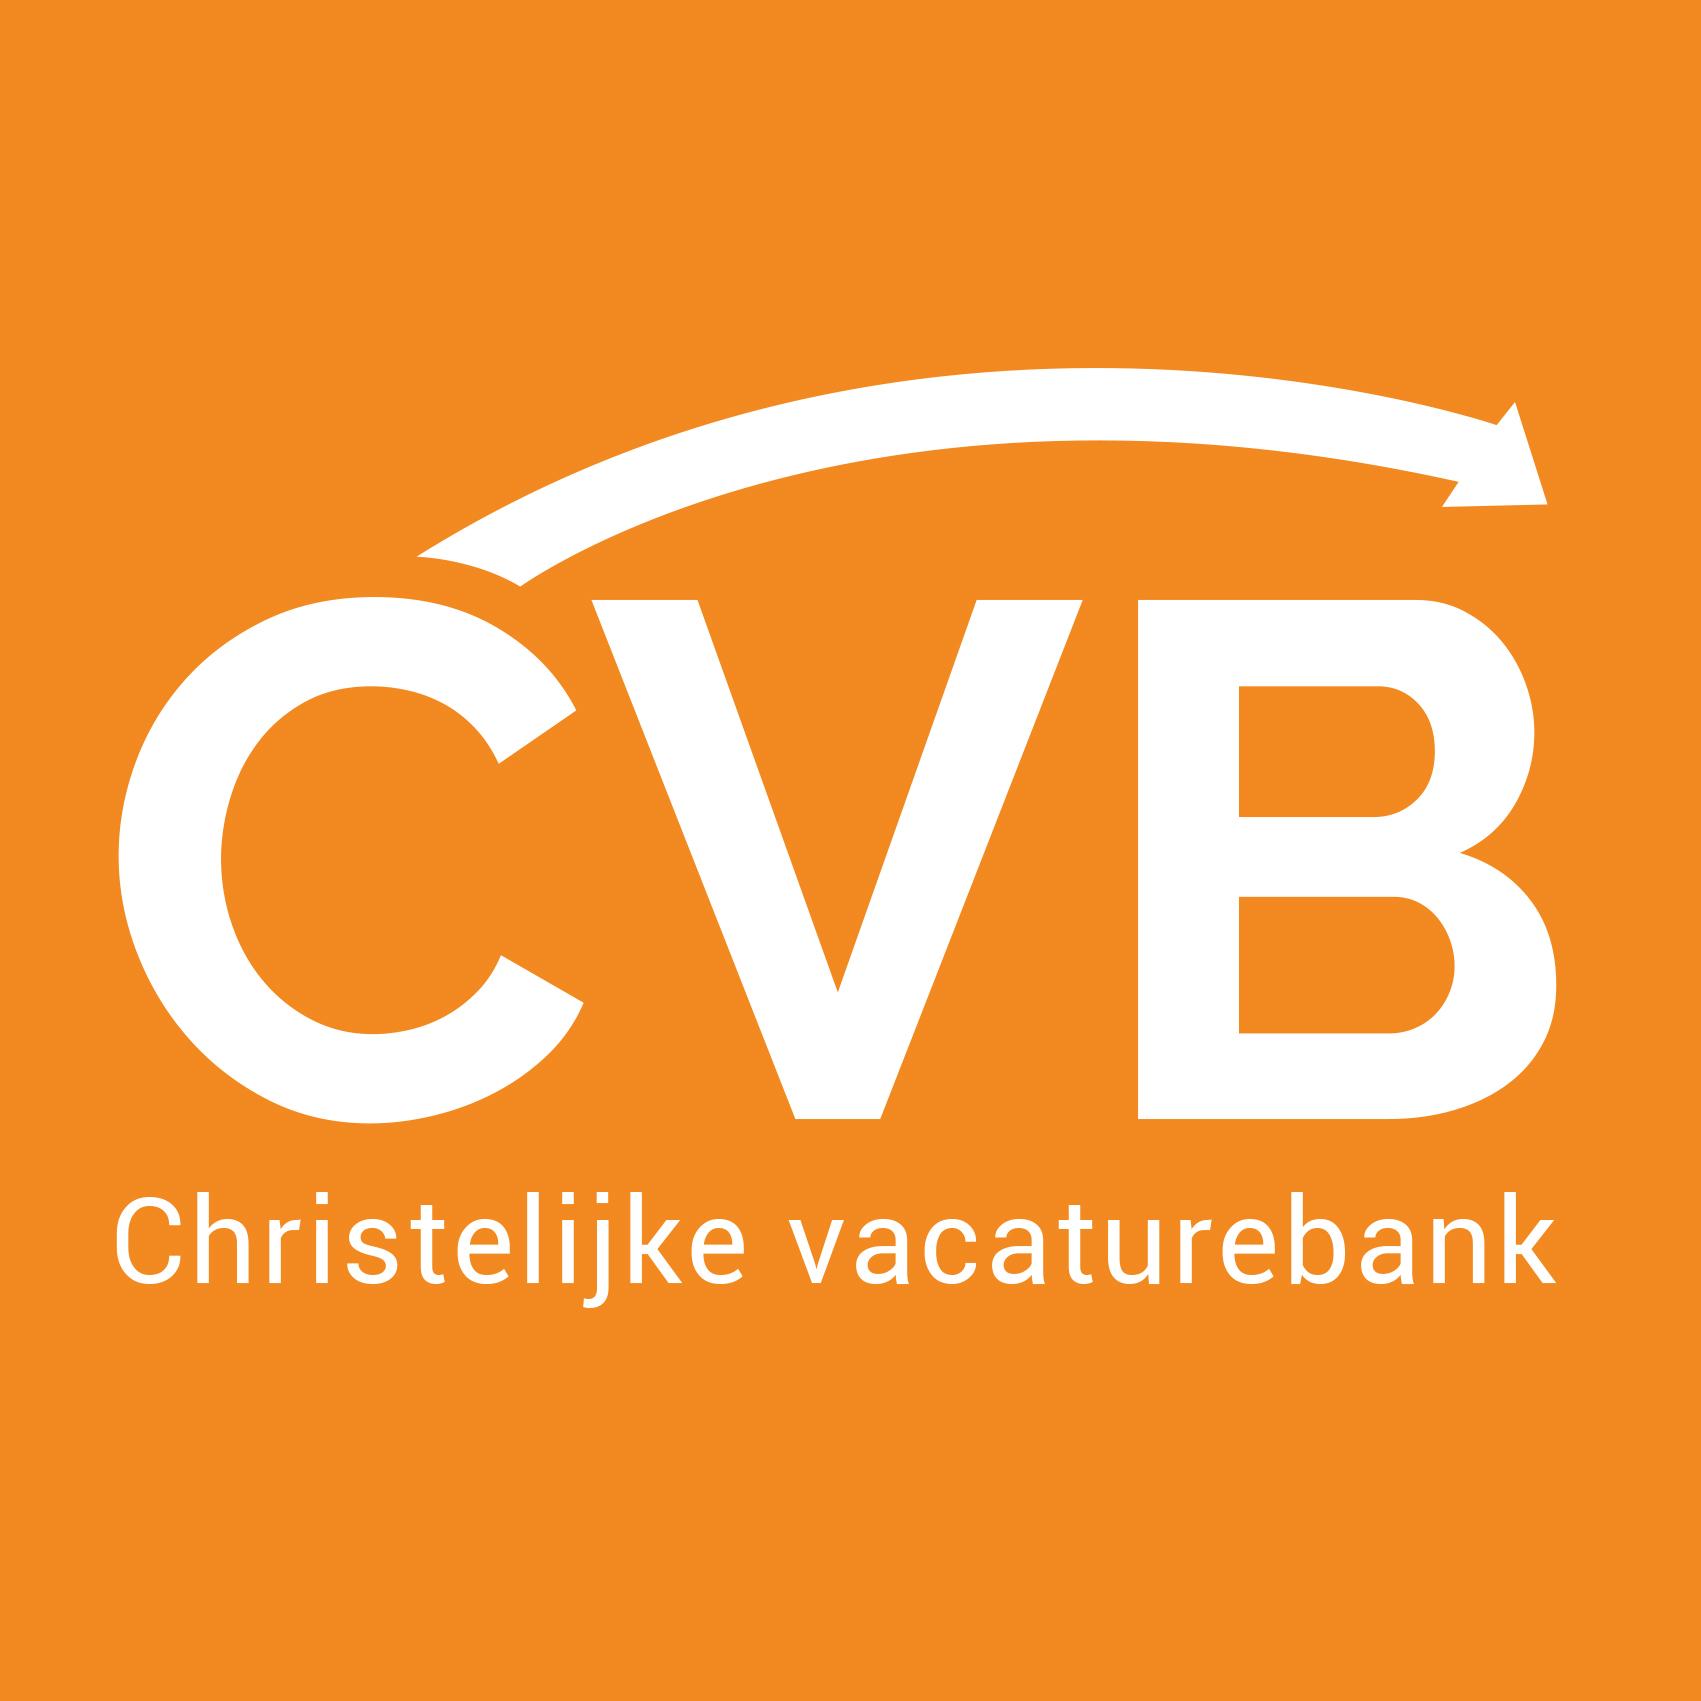 Christelijke Vacaturebank